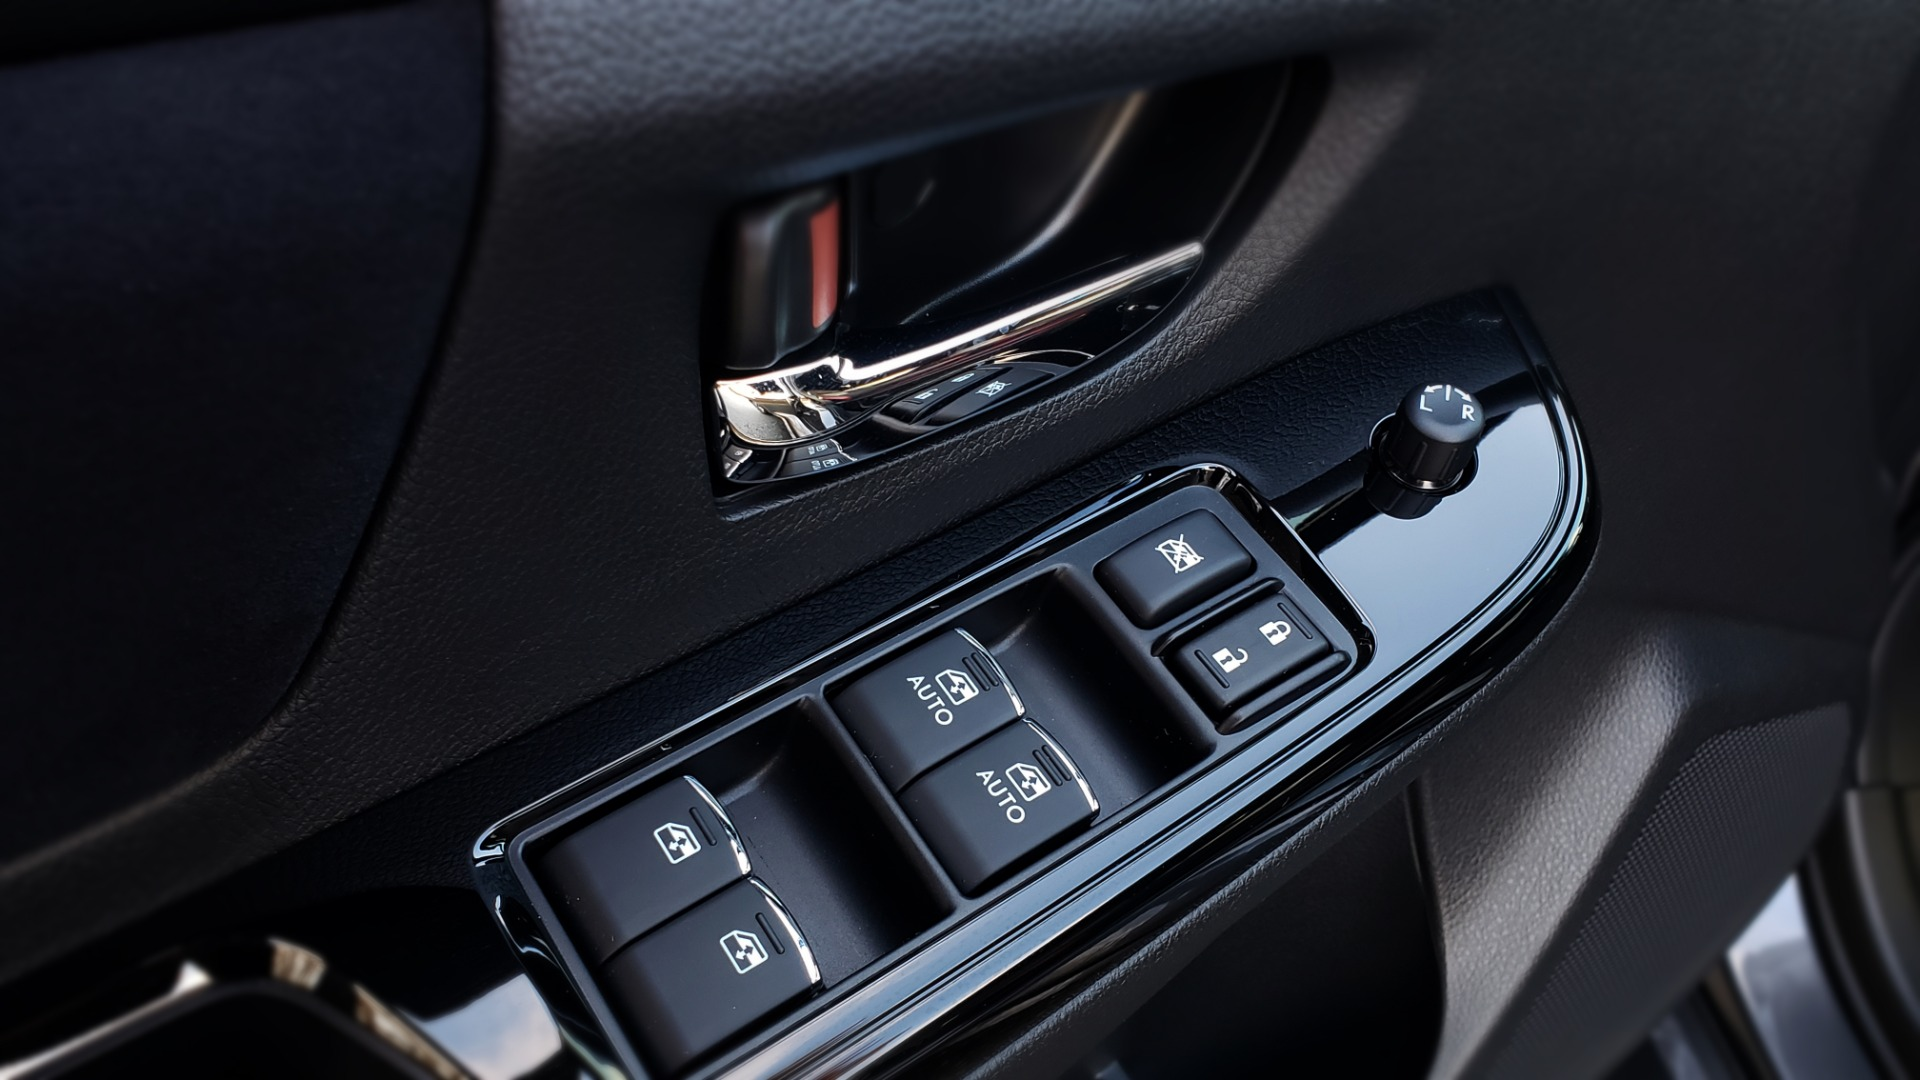 Used 2020 Subaru WRX STI 2.5L TURBO / 6-SPEED MANUAL / RECARO SEATS / REARVIEW for sale Sold at Formula Imports in Charlotte NC 28227 31